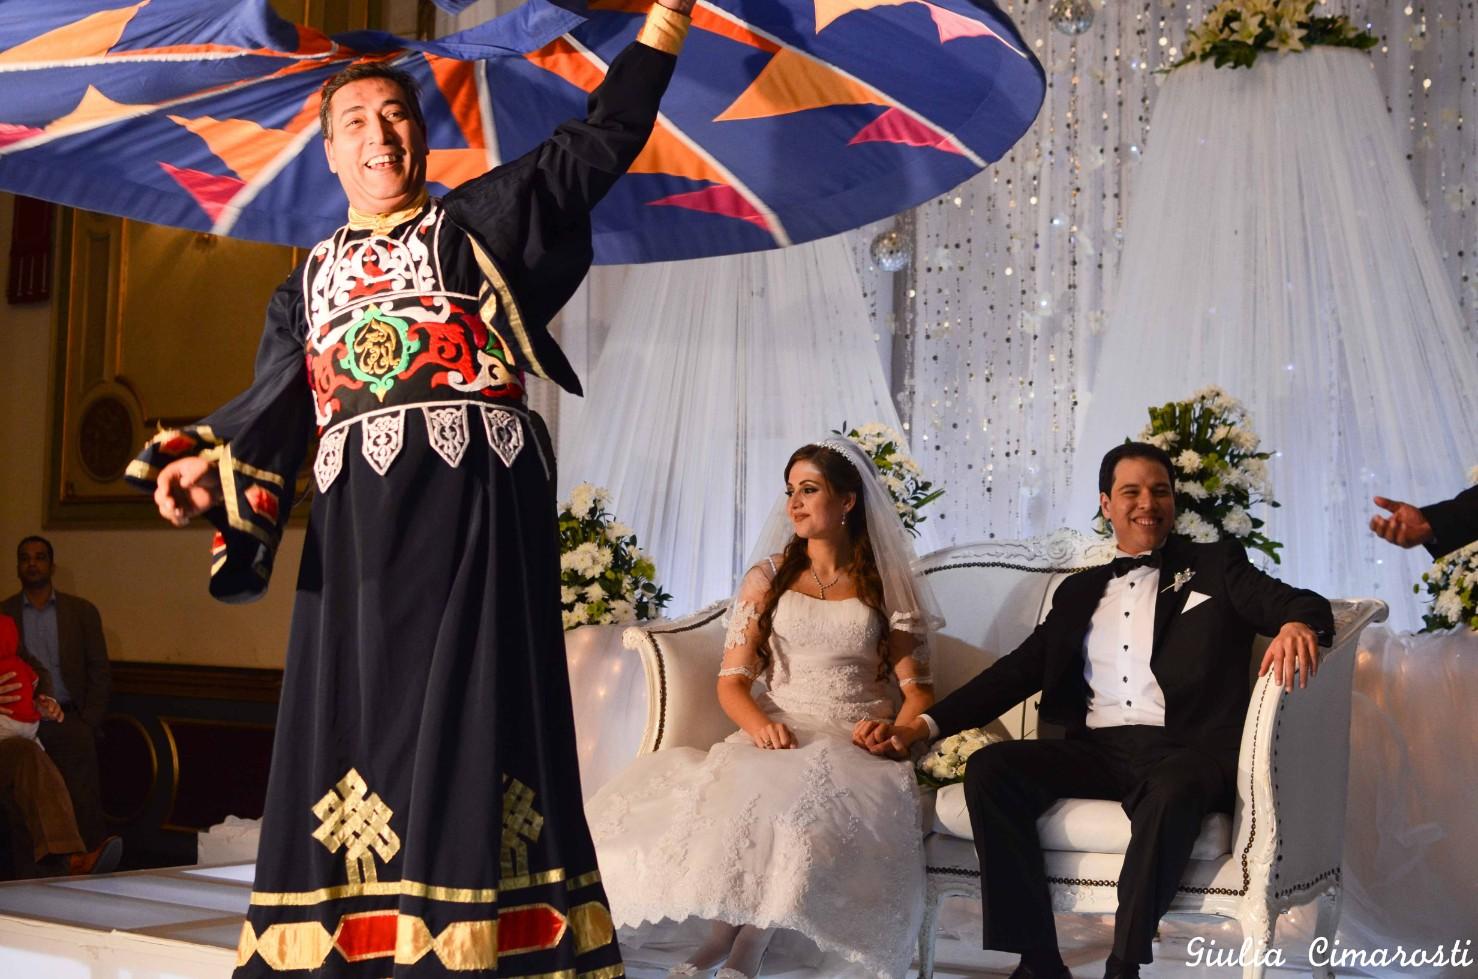 egyptian-wedding-tradition-1-2